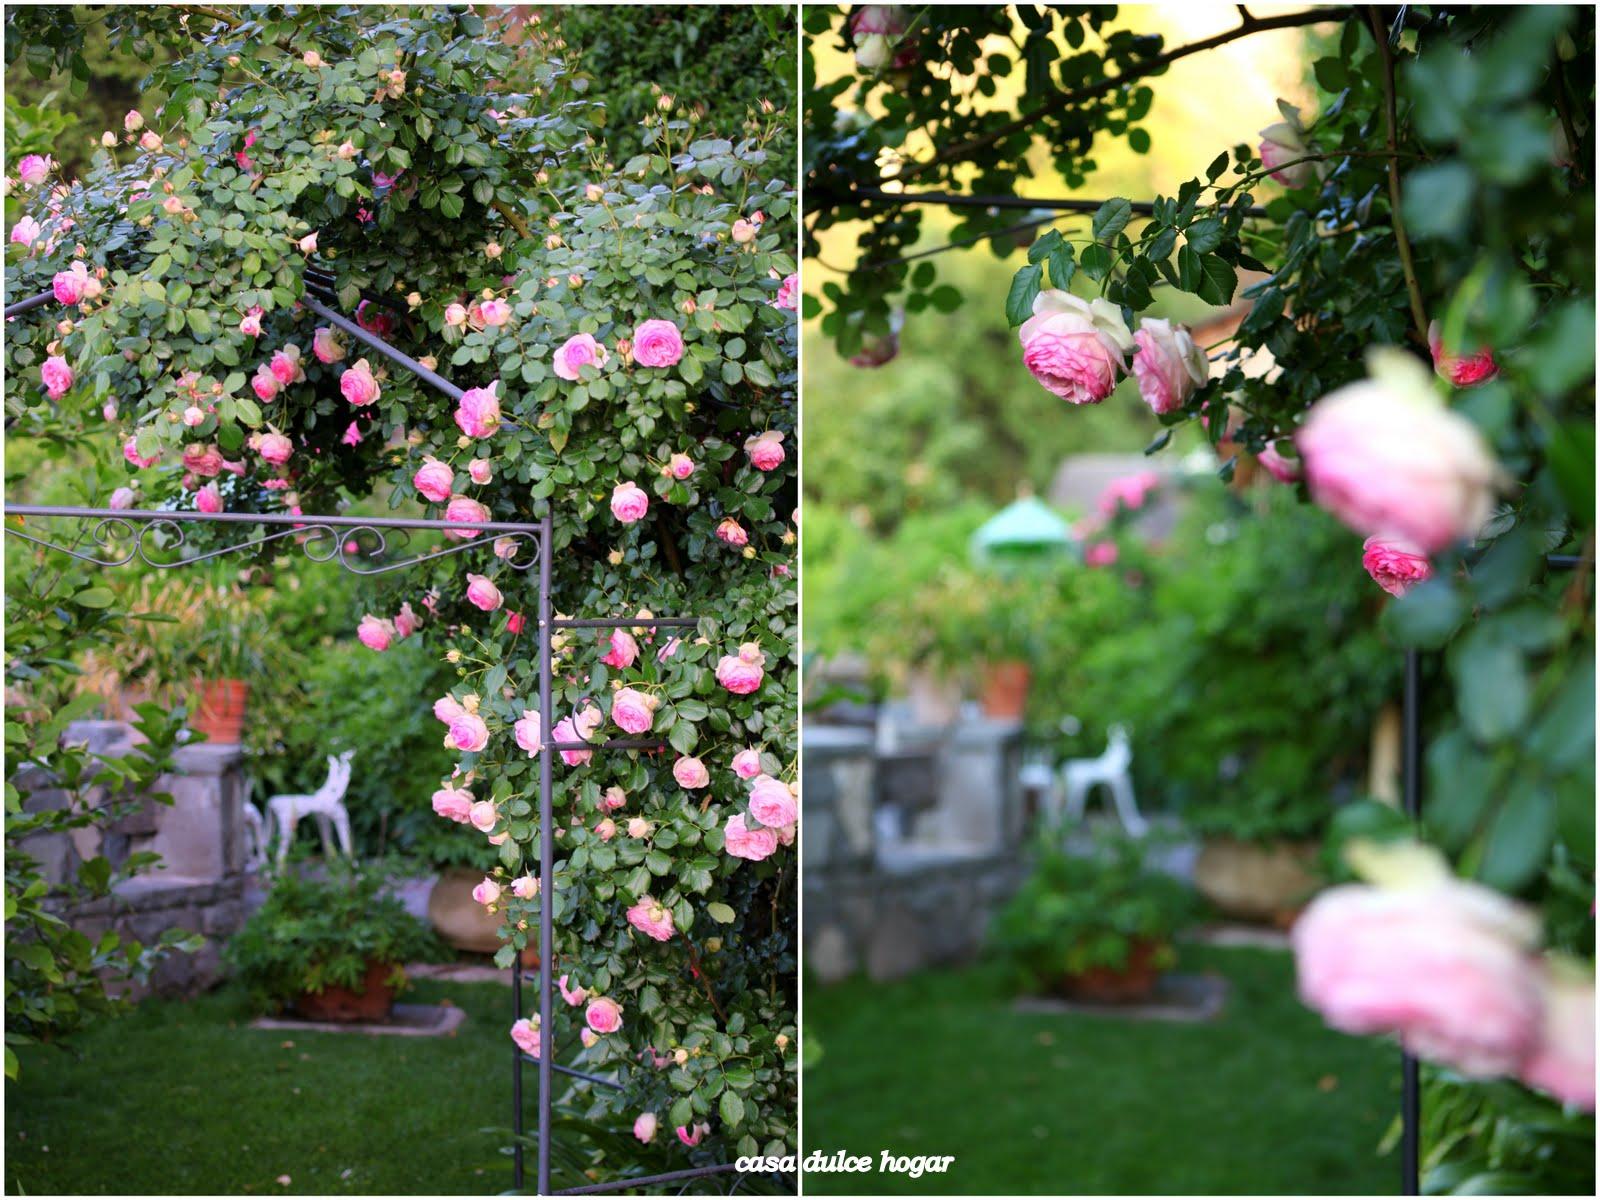 Casa dulce hogar rosas de mi jard n for Ahuyentar gatos de mi jardin